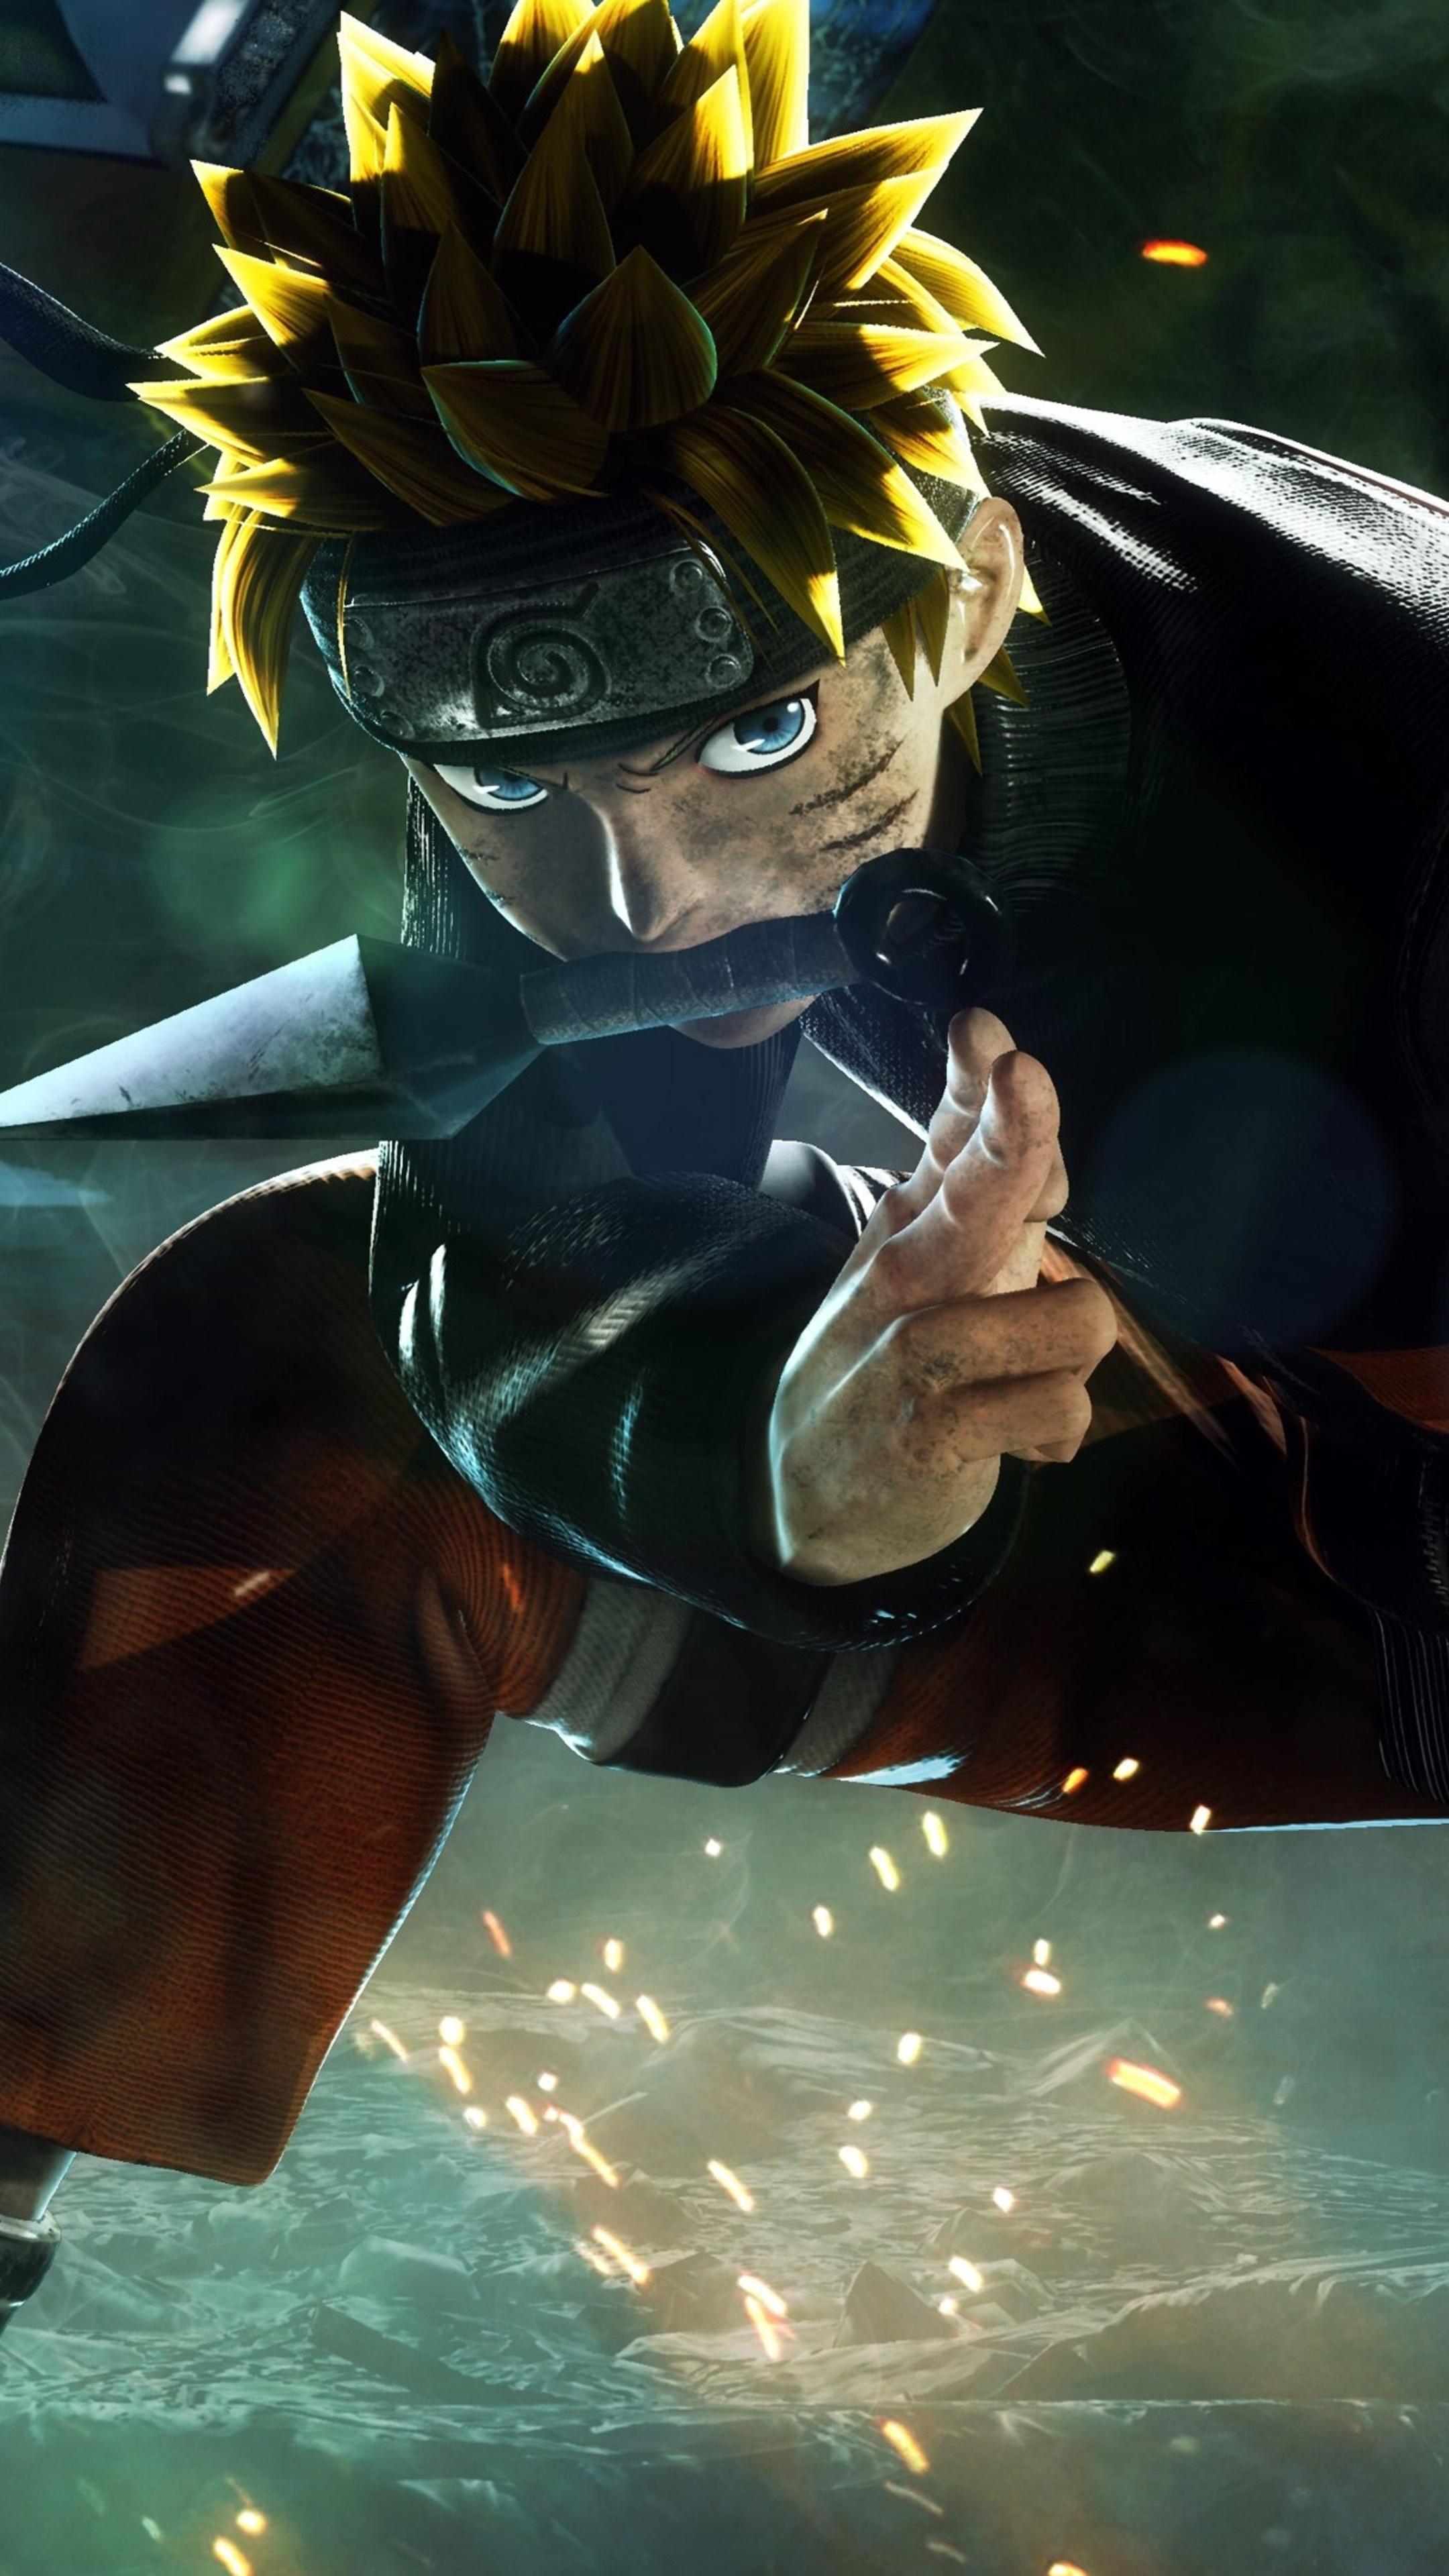 Unduh 710+ Wallpaper Naruto 4k Terbaik